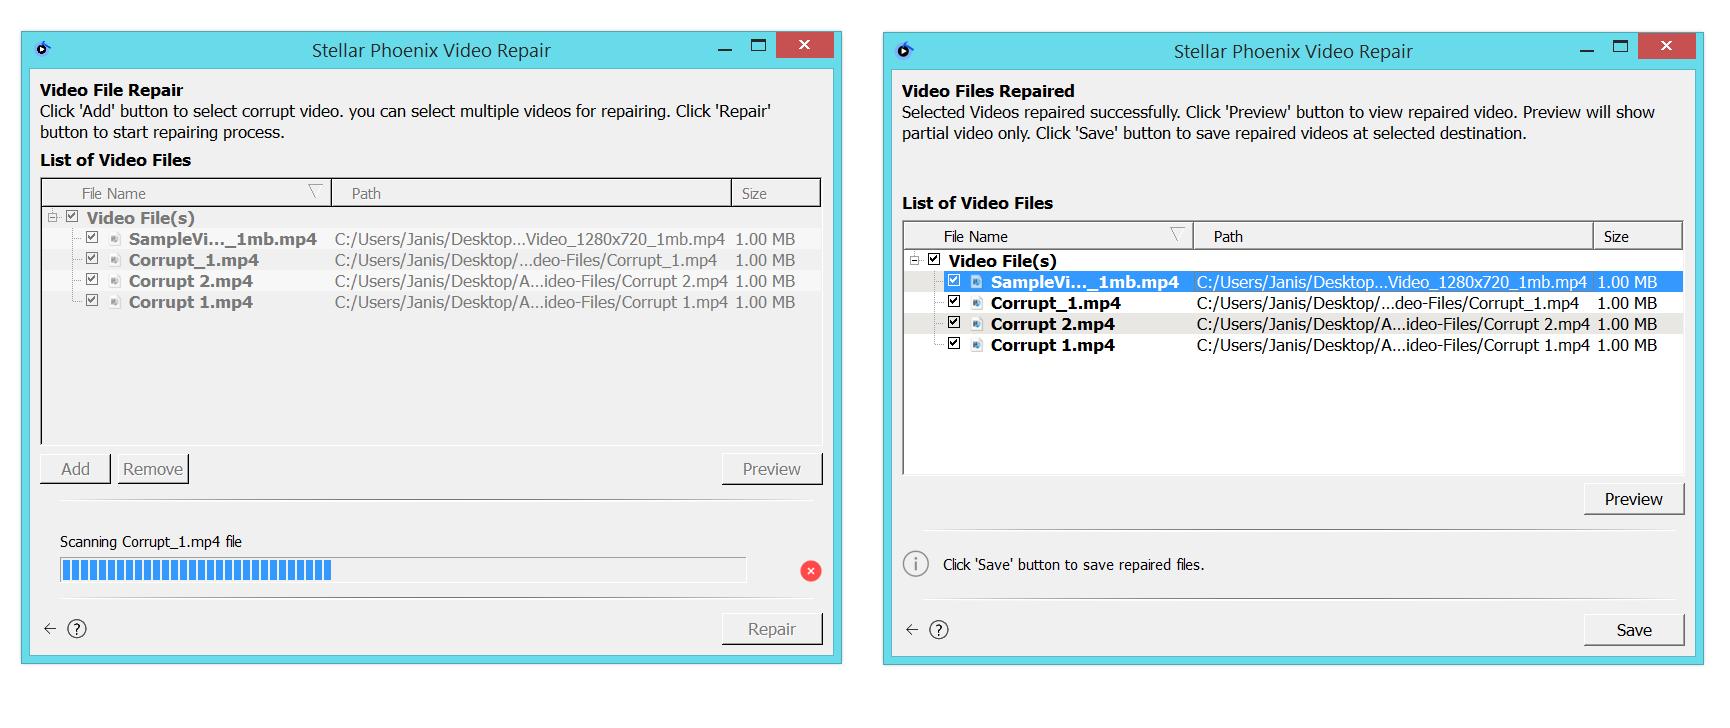 Stellar Phoenix Photo Recovery Titanium, JPEG Repair, Video Repair software, video repair process